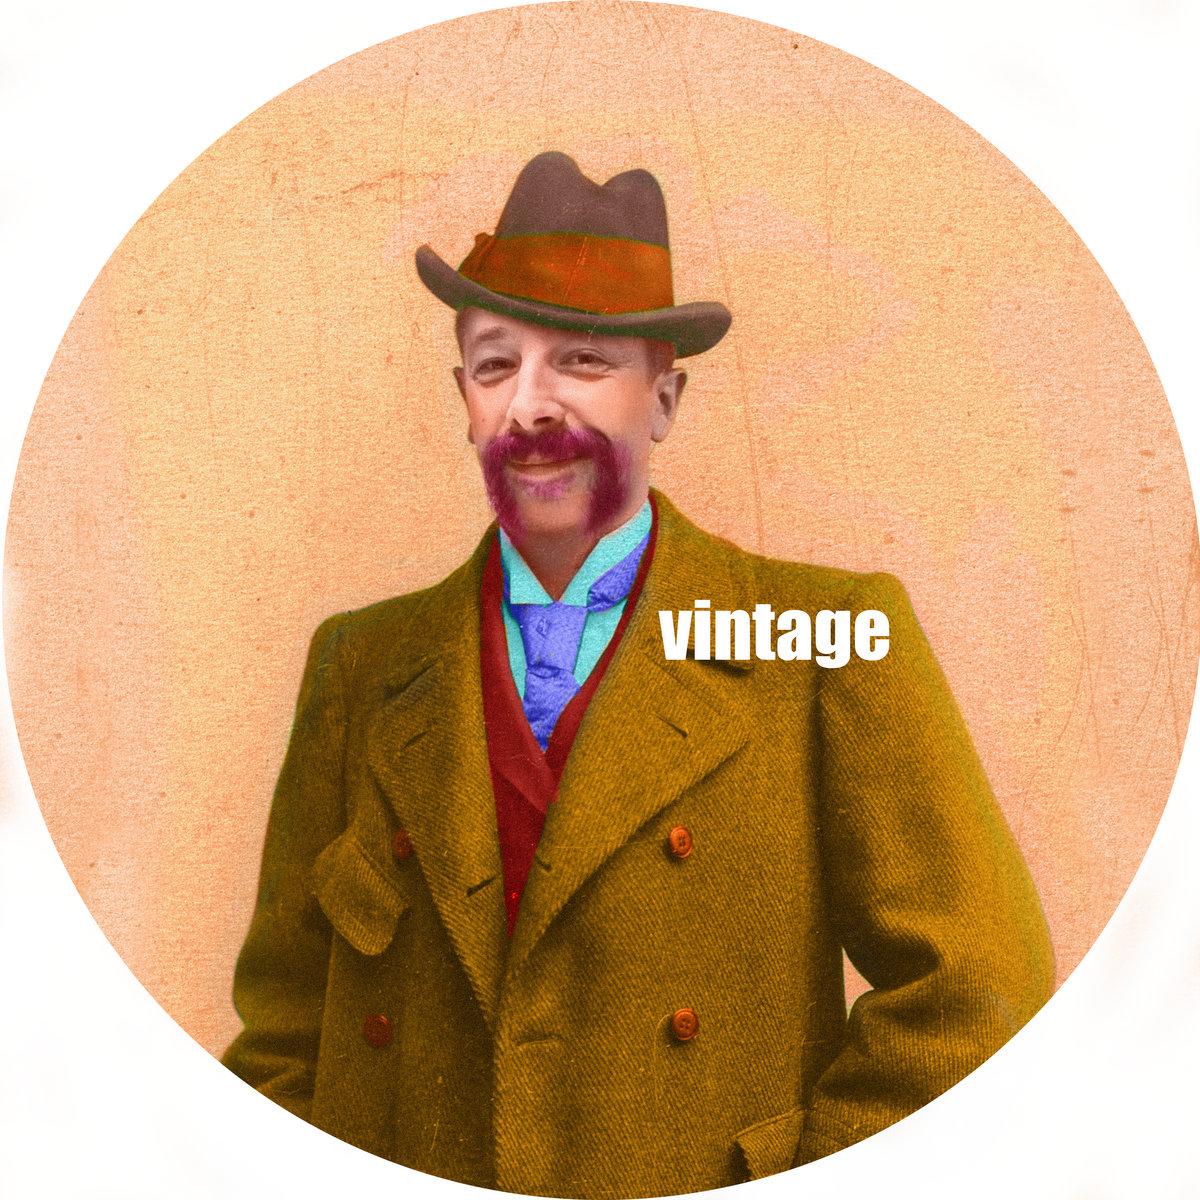 zamów portret vintage